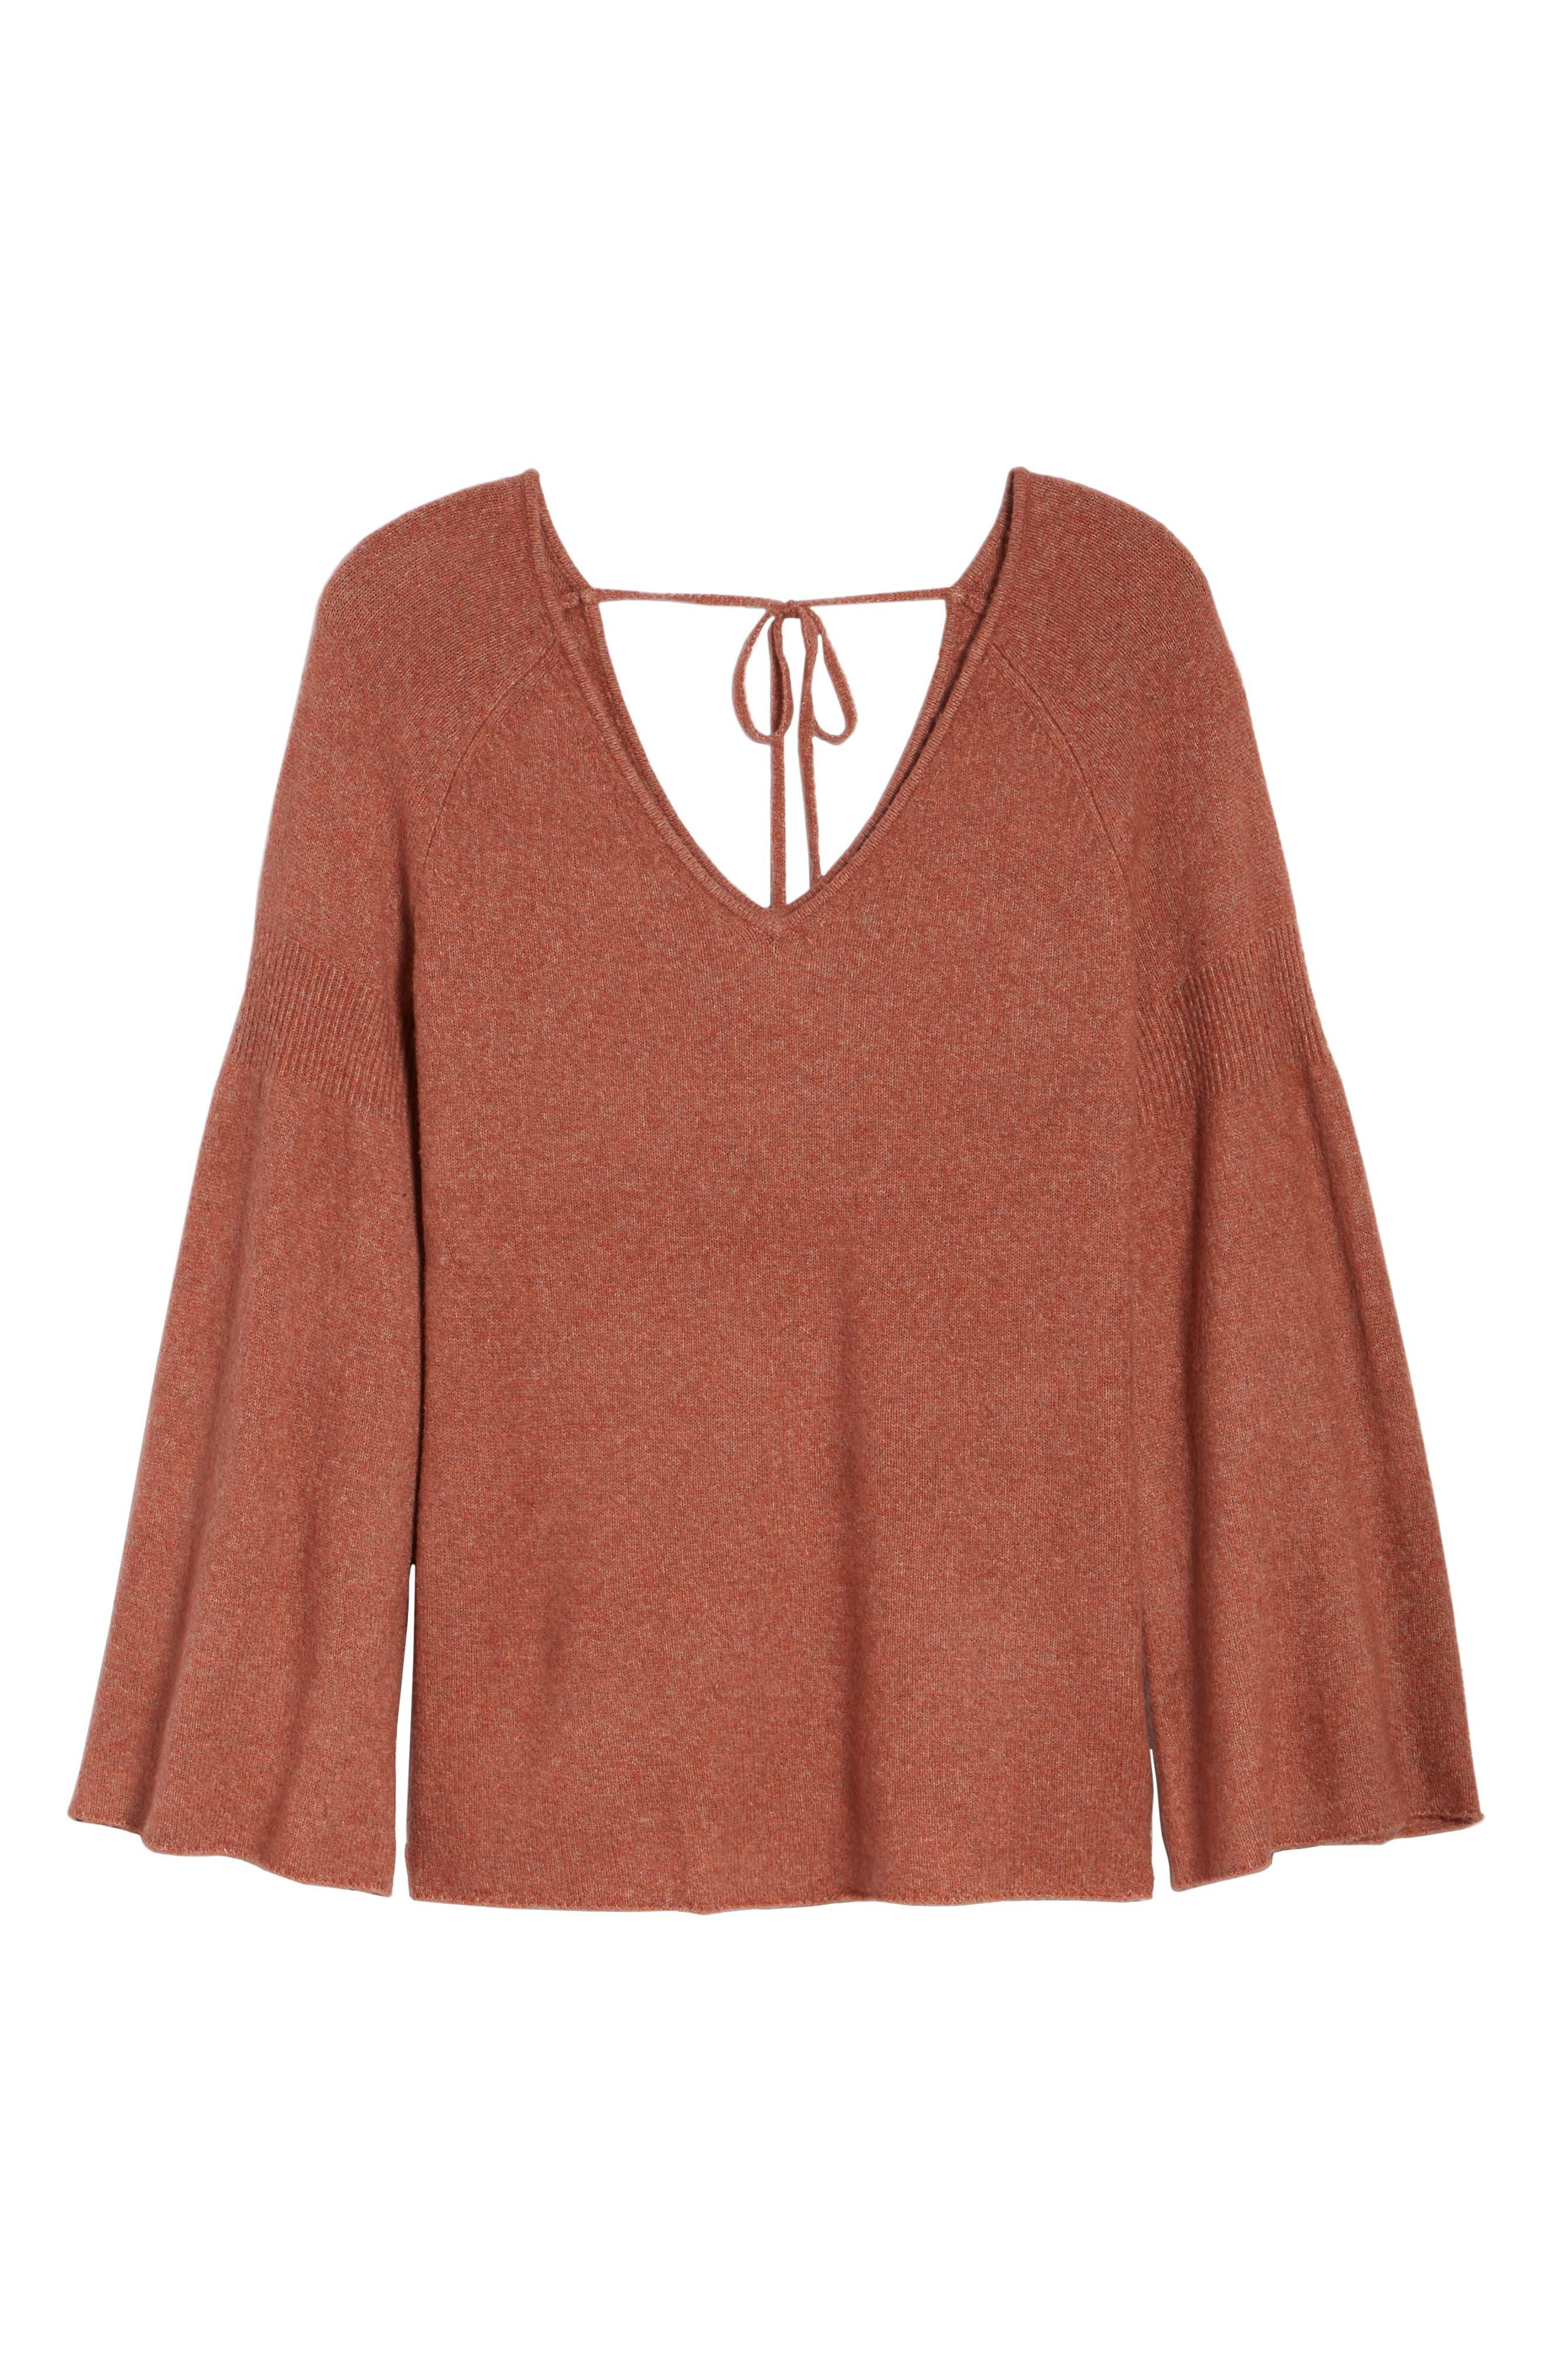 Bell Sleeve Sweater,                             Alternate thumbnail 5, color,                             Coral Rose Tea Rainbow Multi